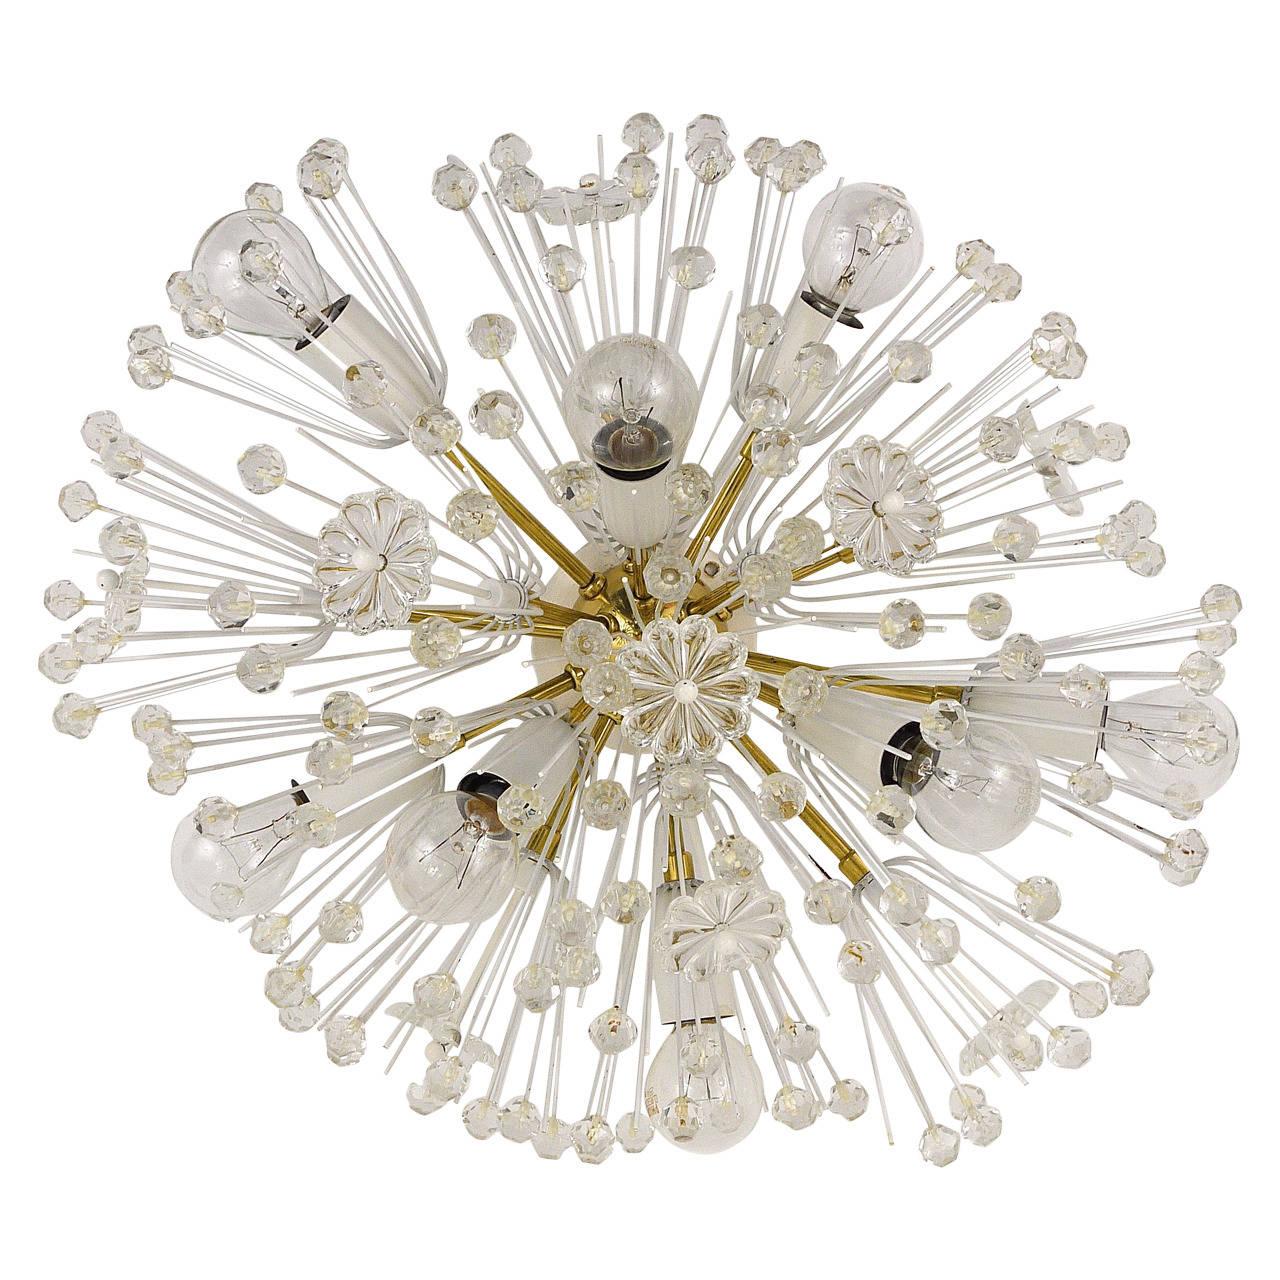 Oval Emil Stejnar Brass Crystal Flush Mount or Sconce, Rupert Nikoll, 1950s